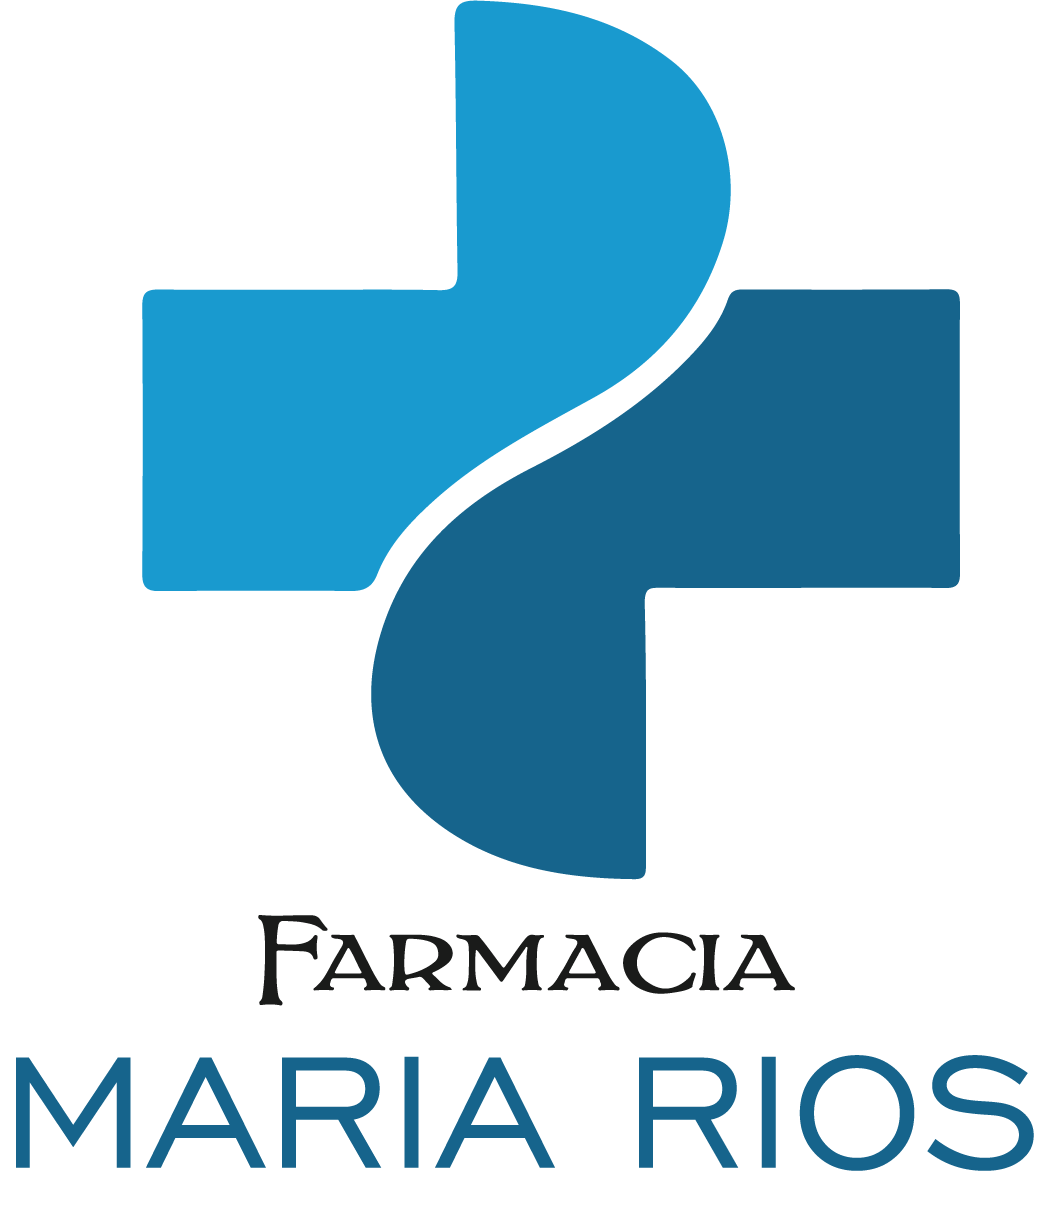 Farmacia María Ríos